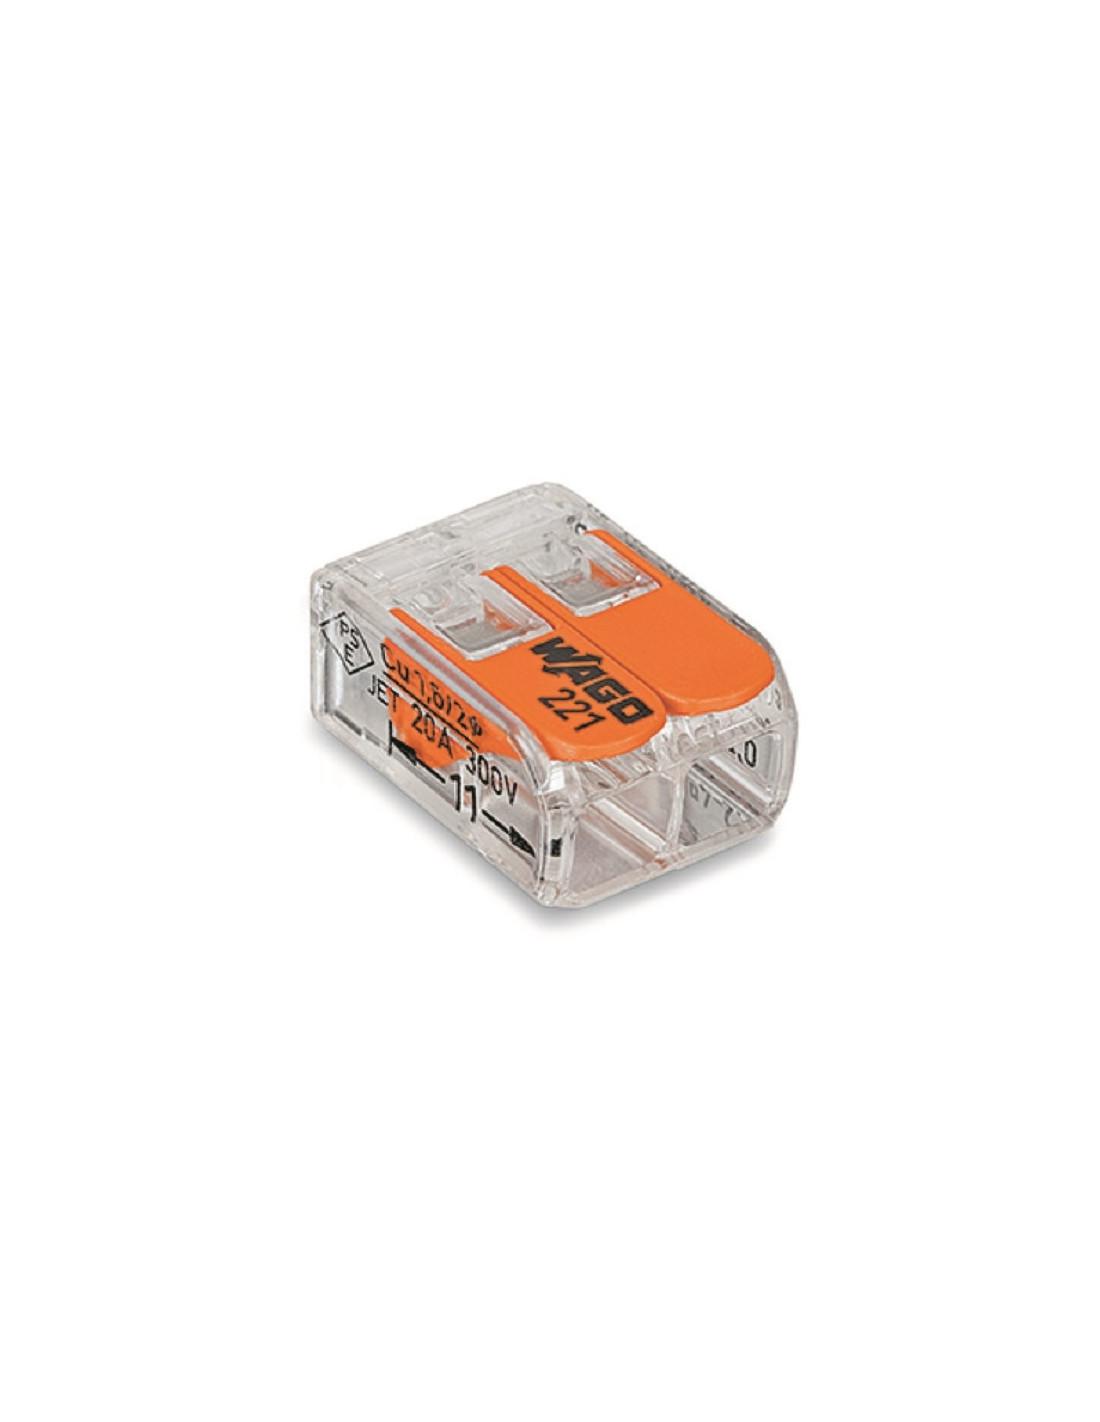 Regleta de empalmes wago 221 de 2 cables tienda de - Regleta para cables ...